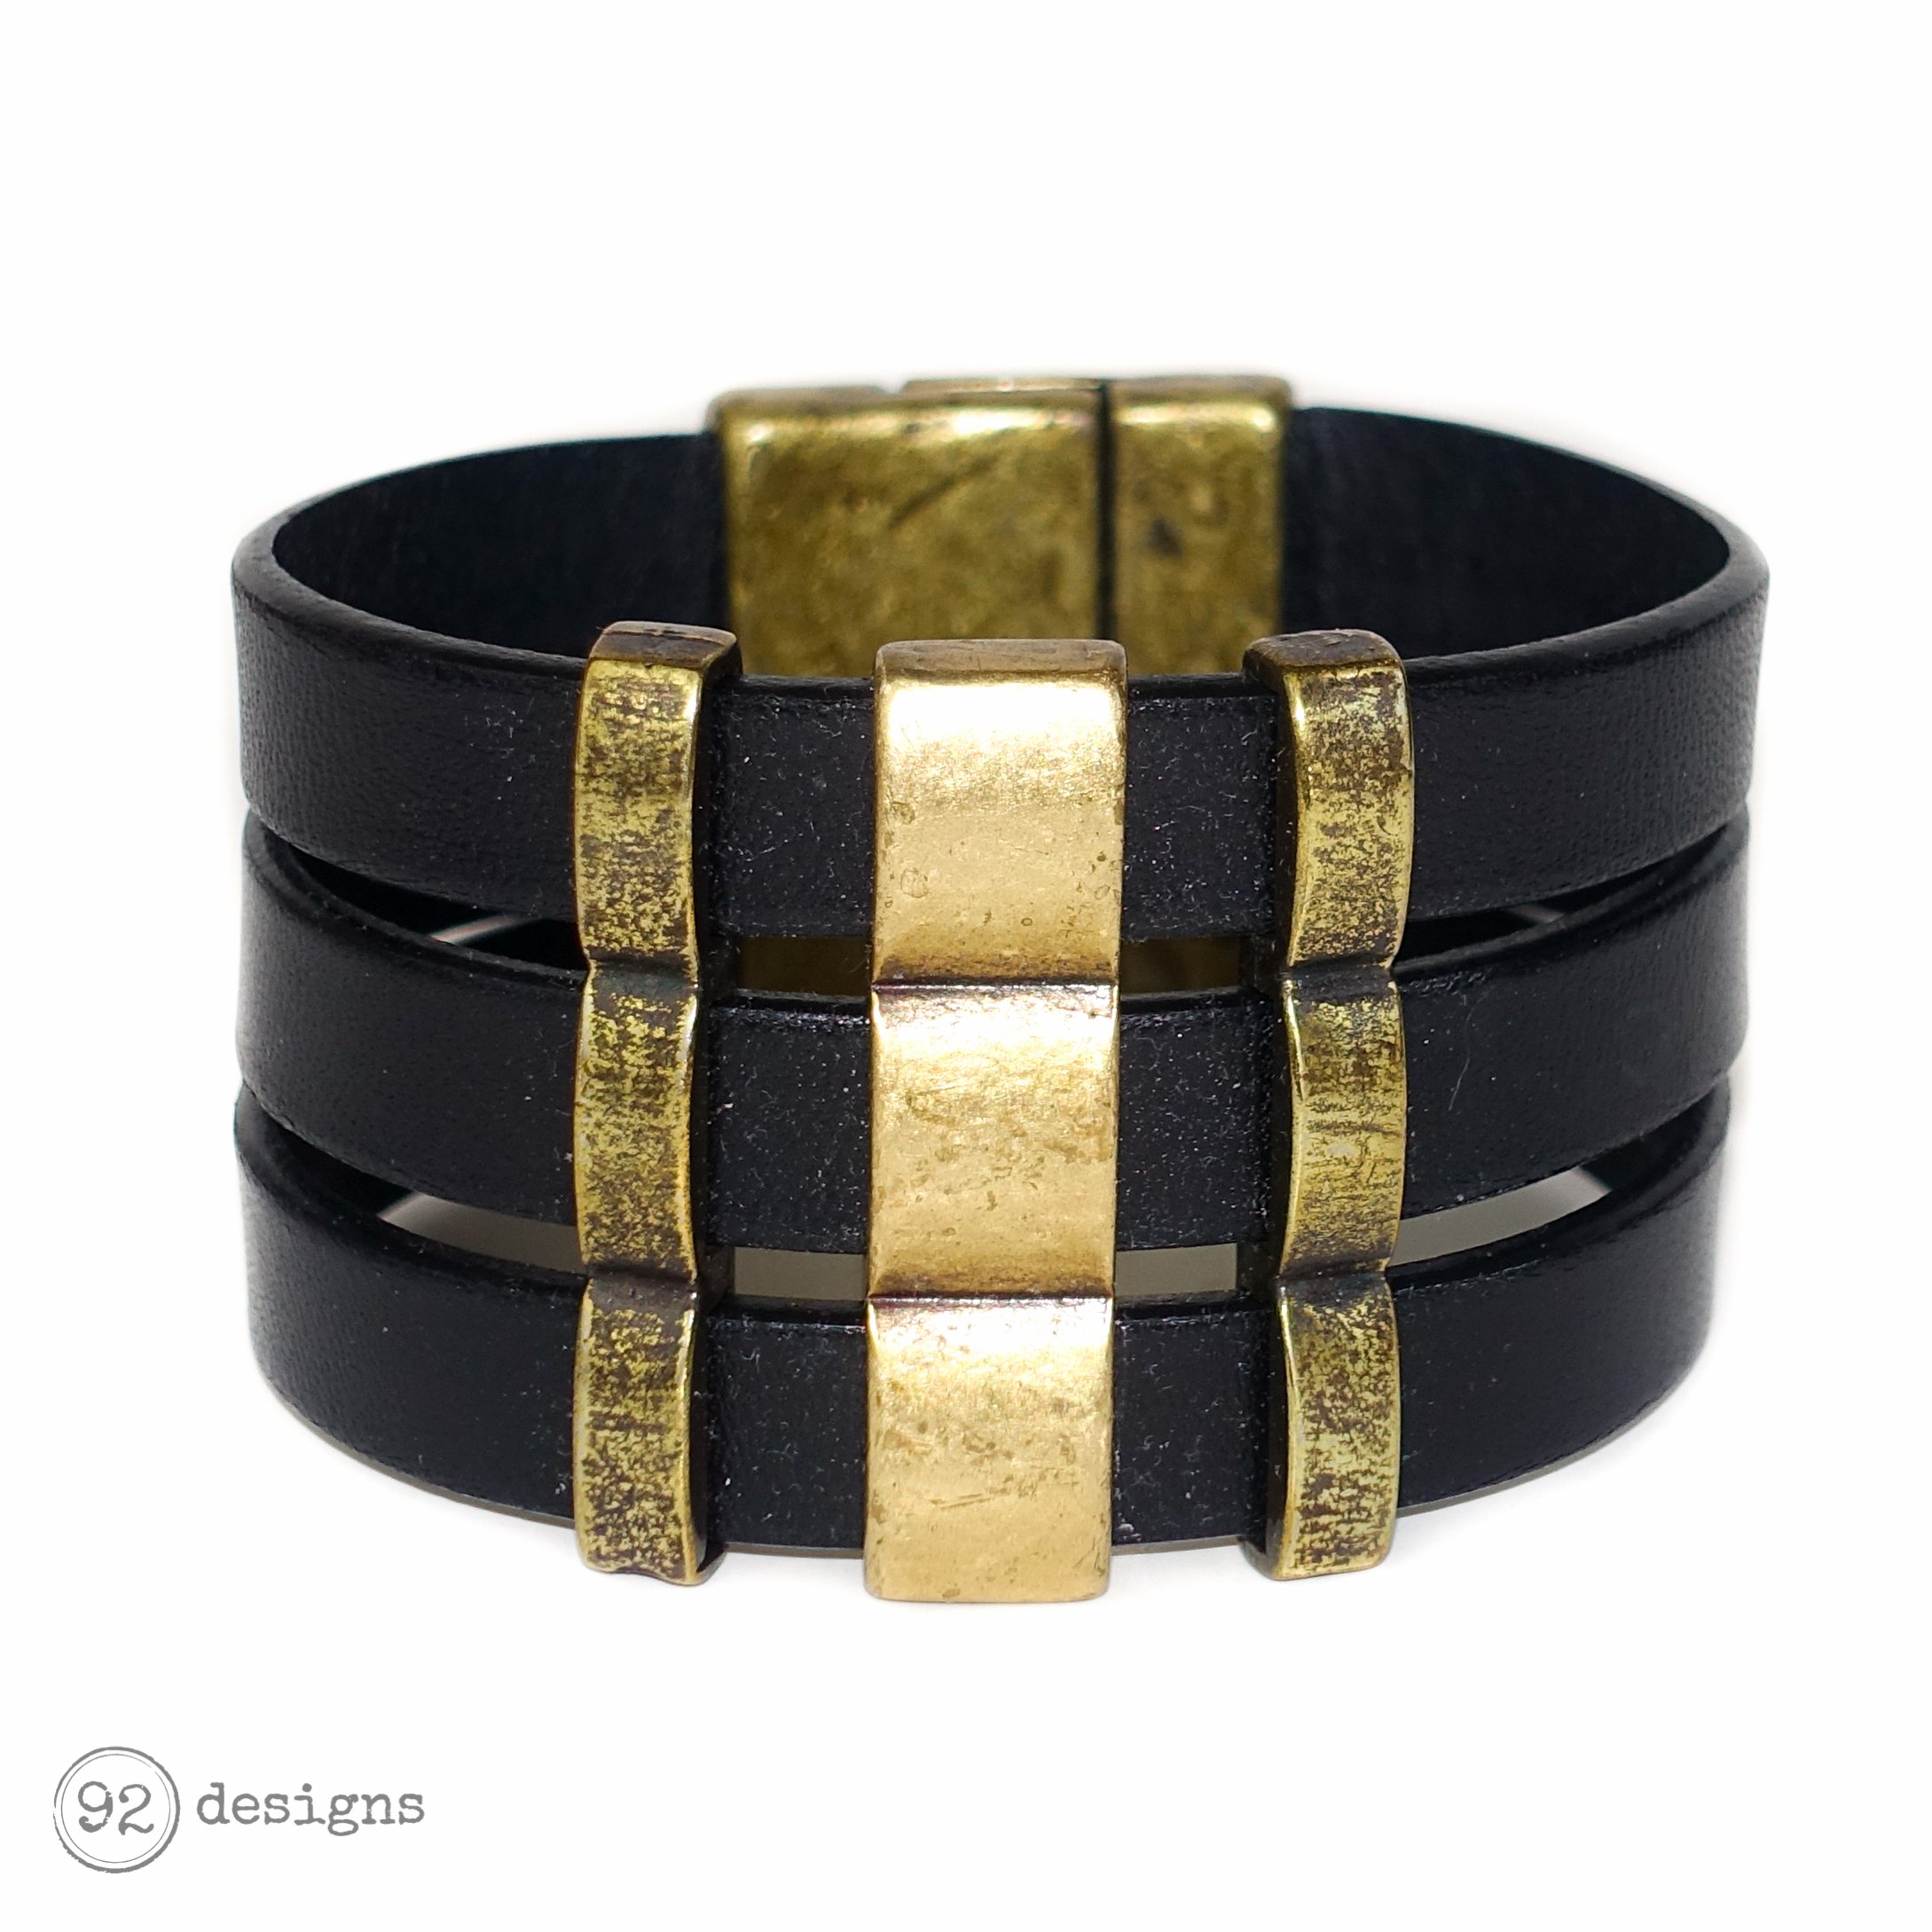 Triple Leather Cuff - black:brass